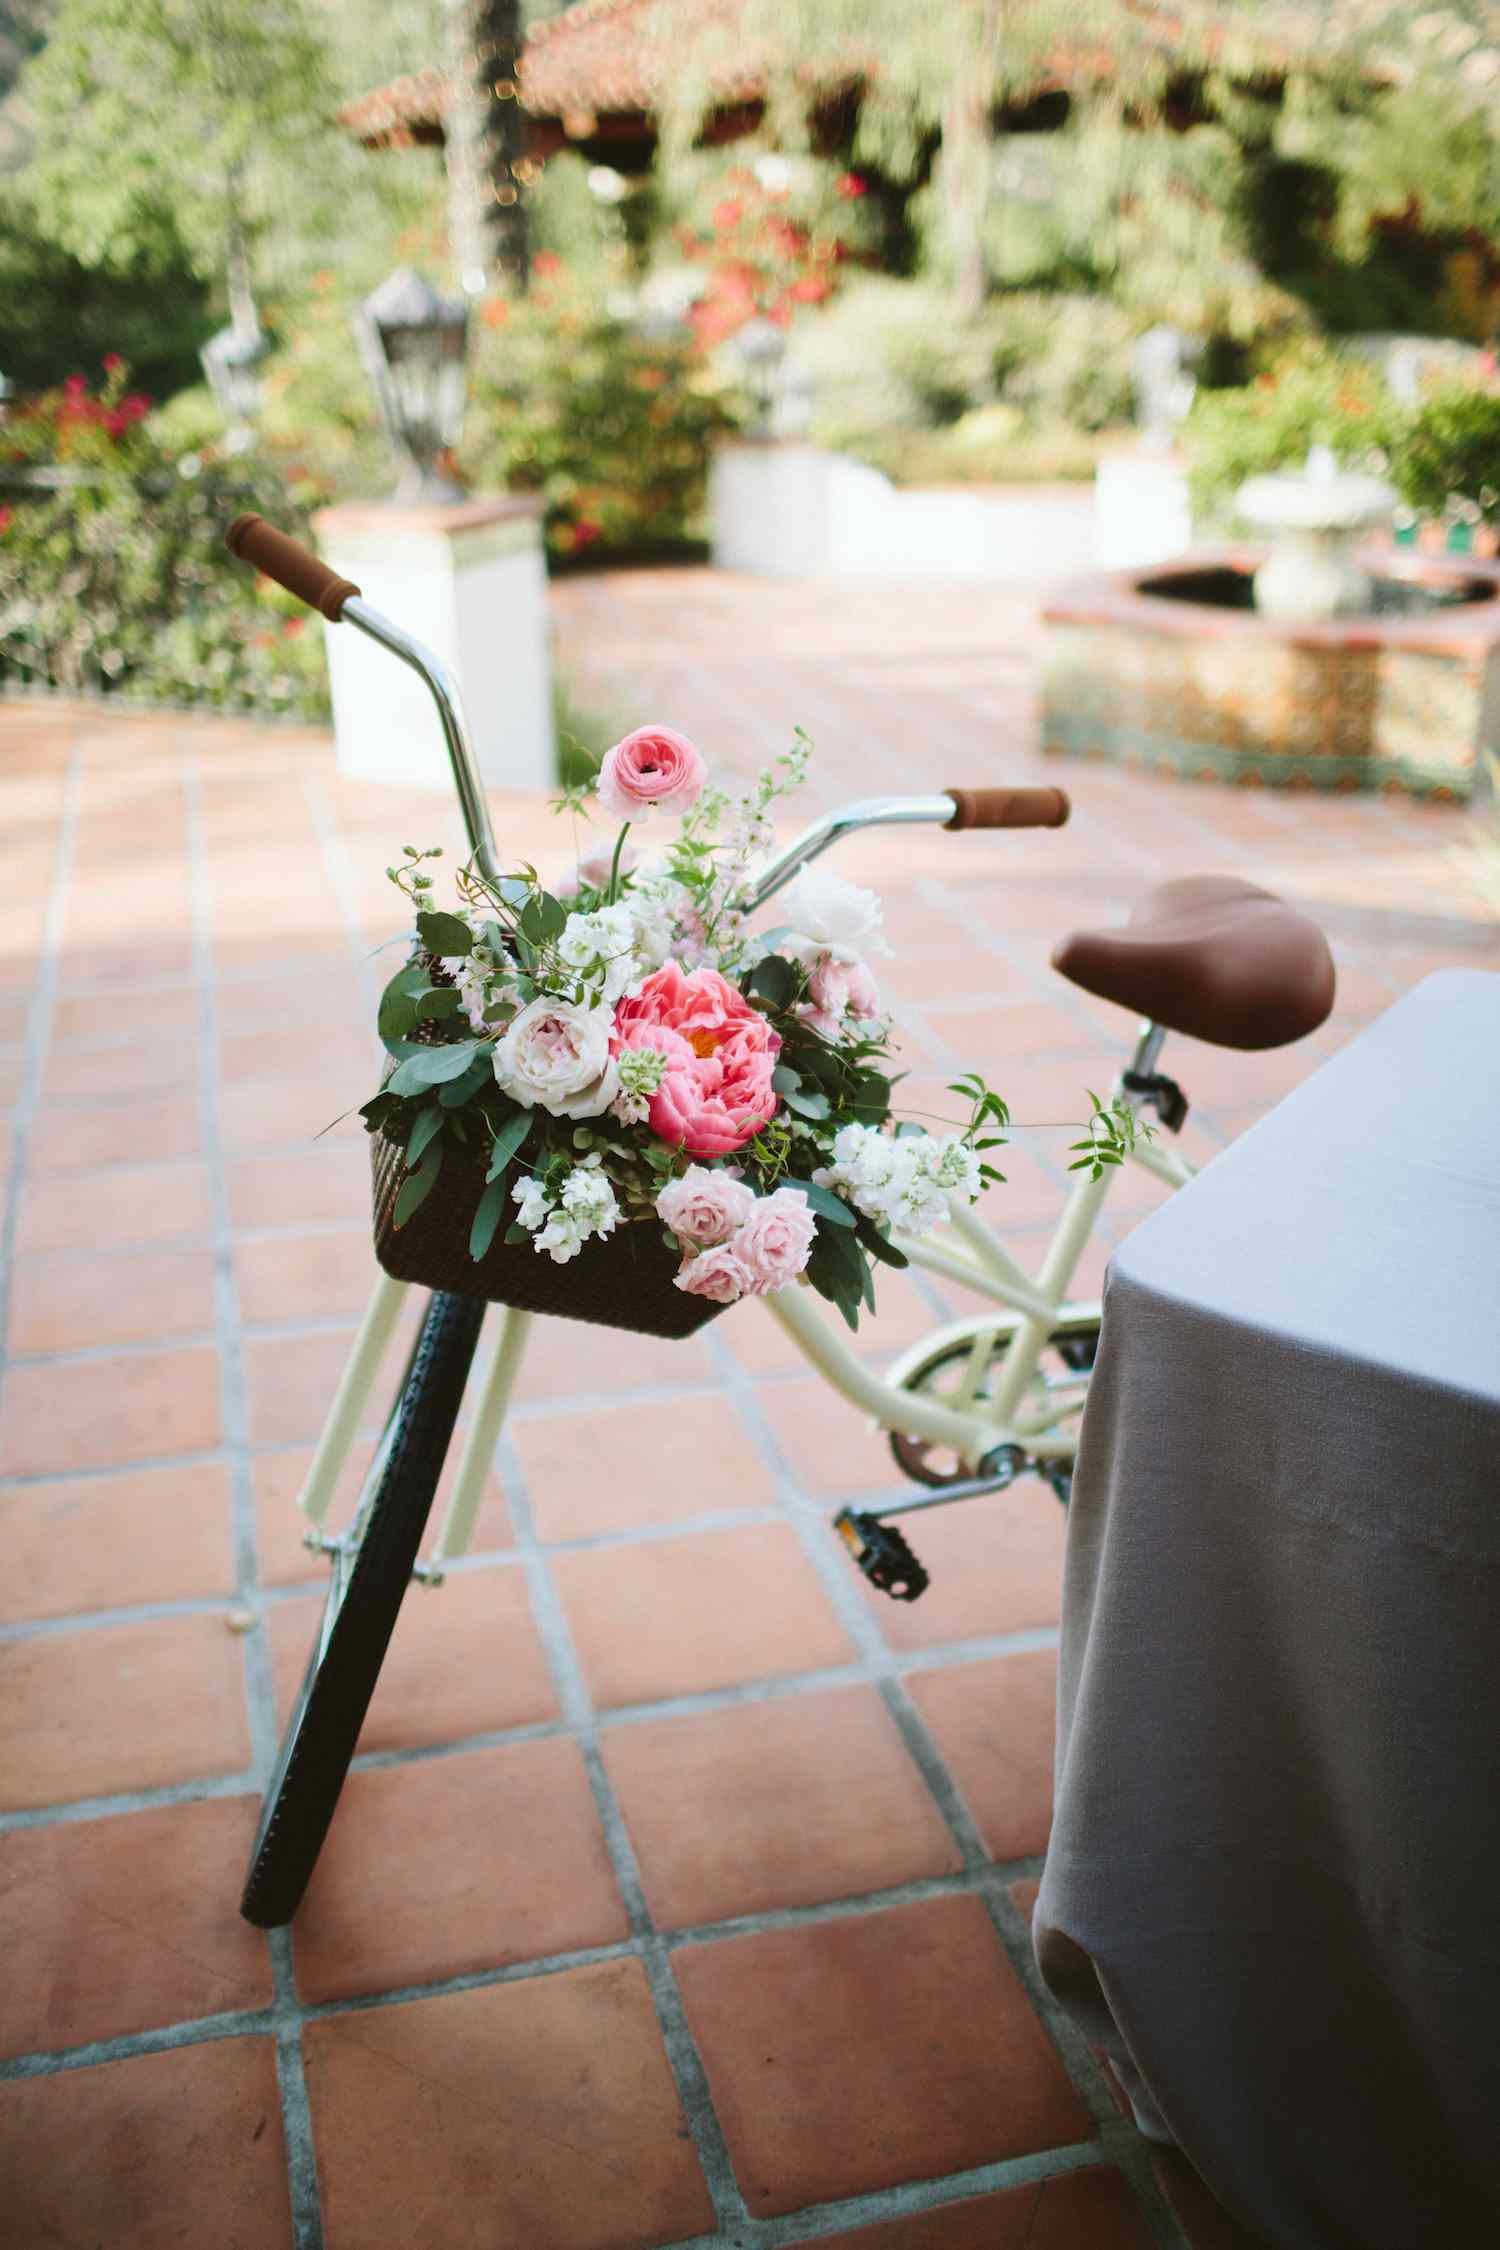 Bike with flowers in basket